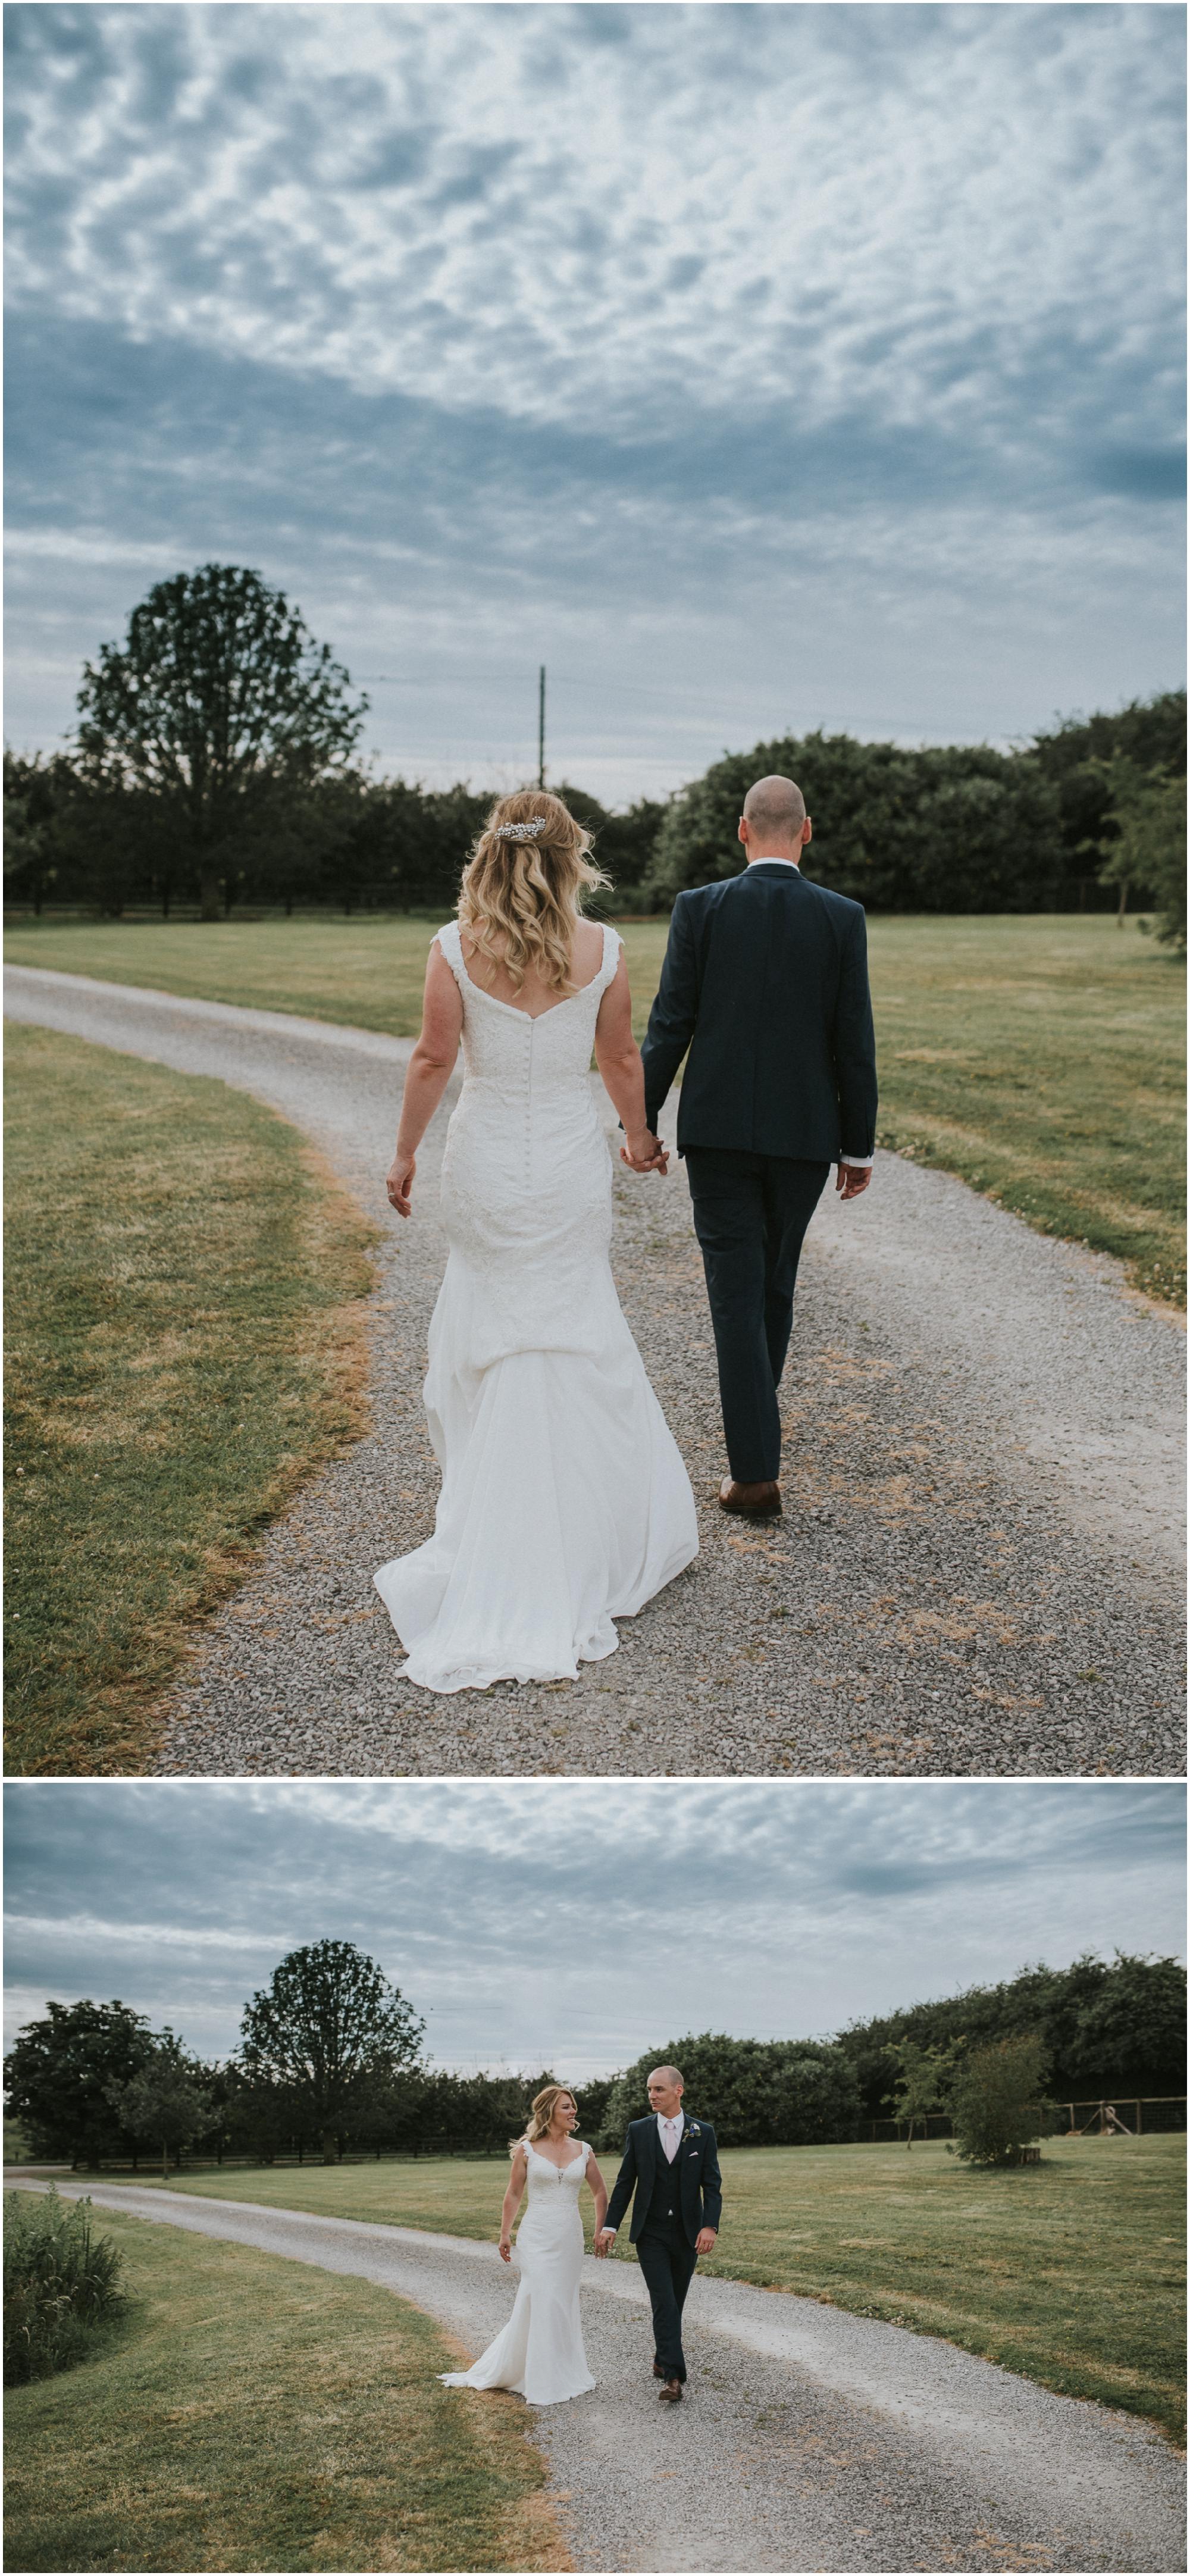 SkipbridegFarmWedding-LukeHolroyd-Yorkshirewedding_0115.jpg